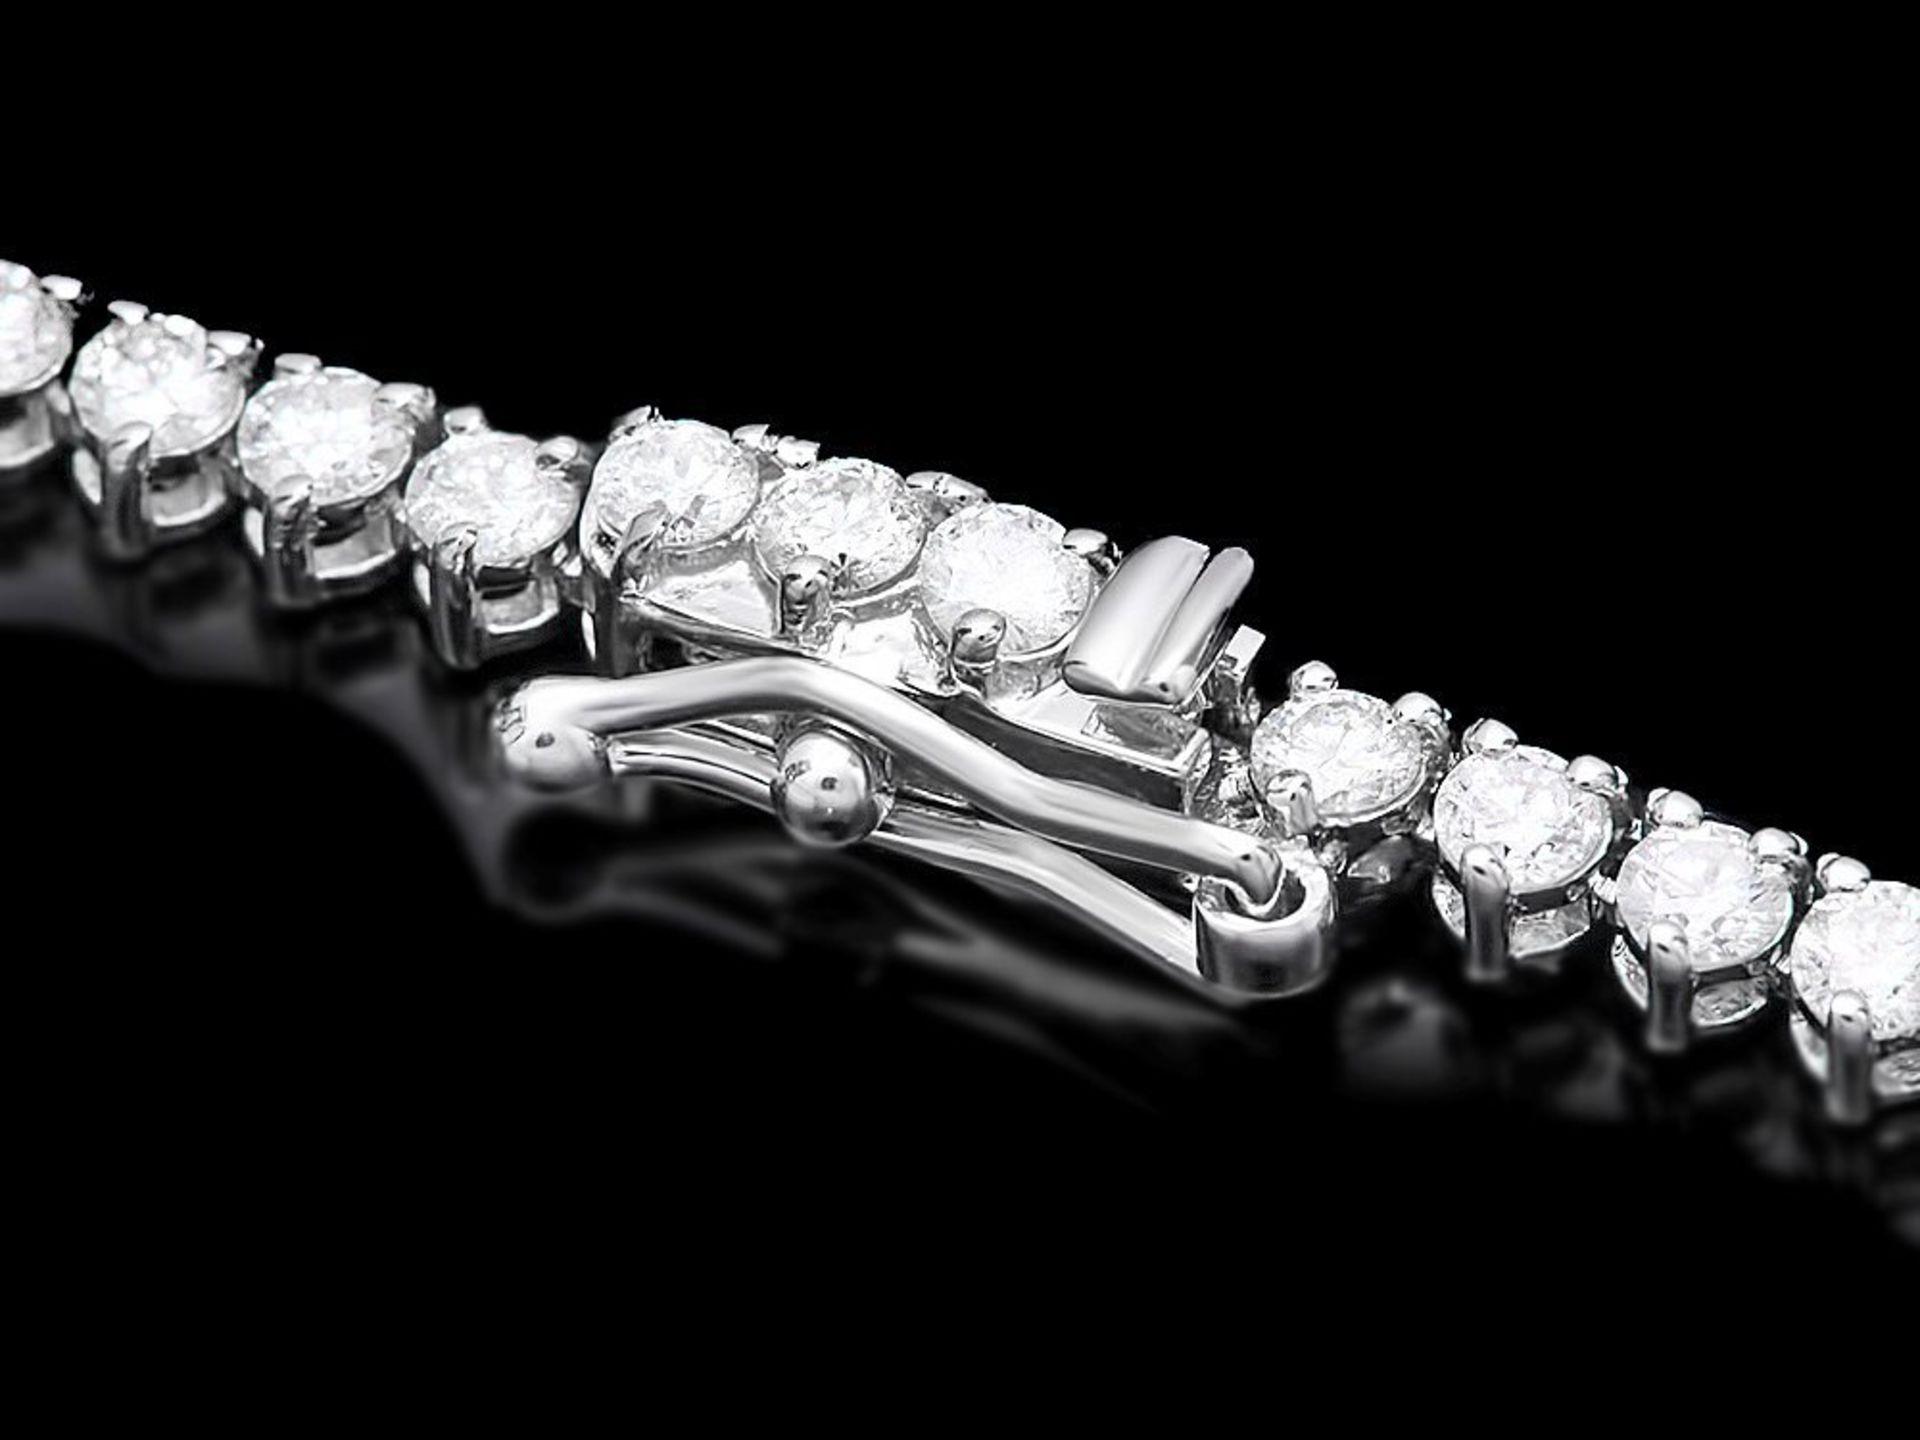 18k White Gold 12.00ct Diamond Necklace - Image 4 of 5